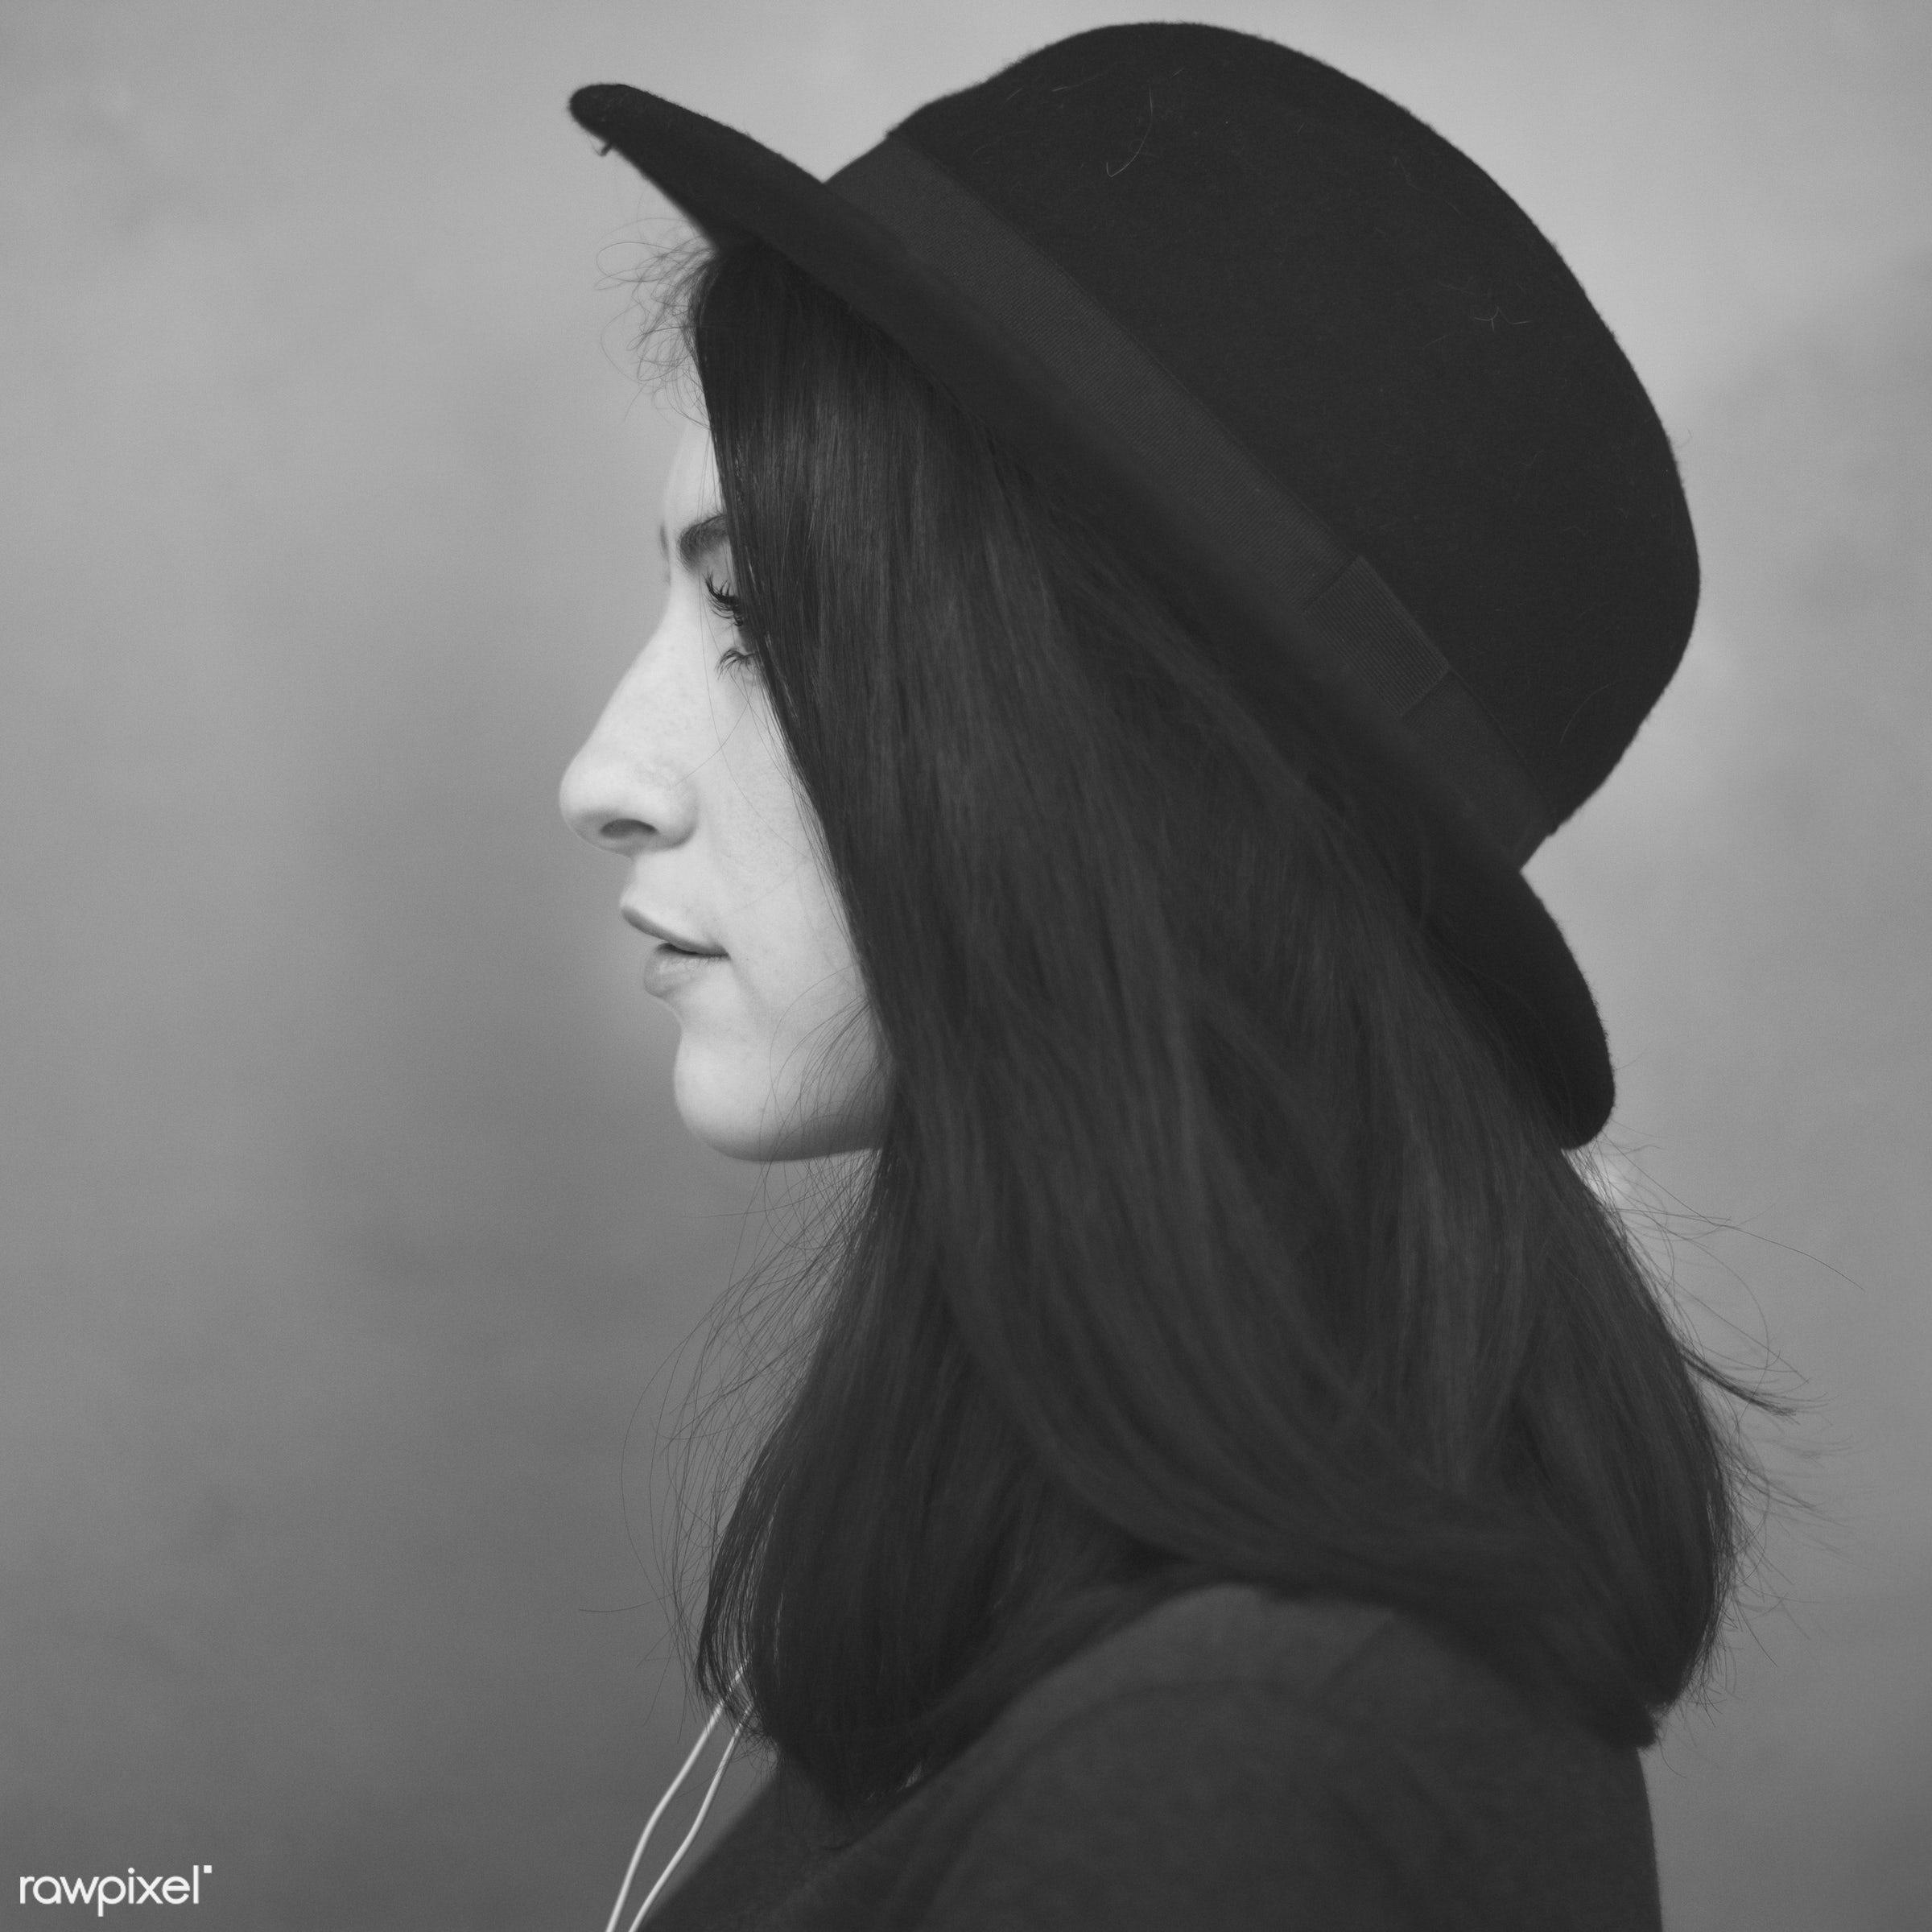 hat, white, attractive, background, beautiful, brunette, casual, concrete, fashion, fashionista, female, girl, head, lady,...